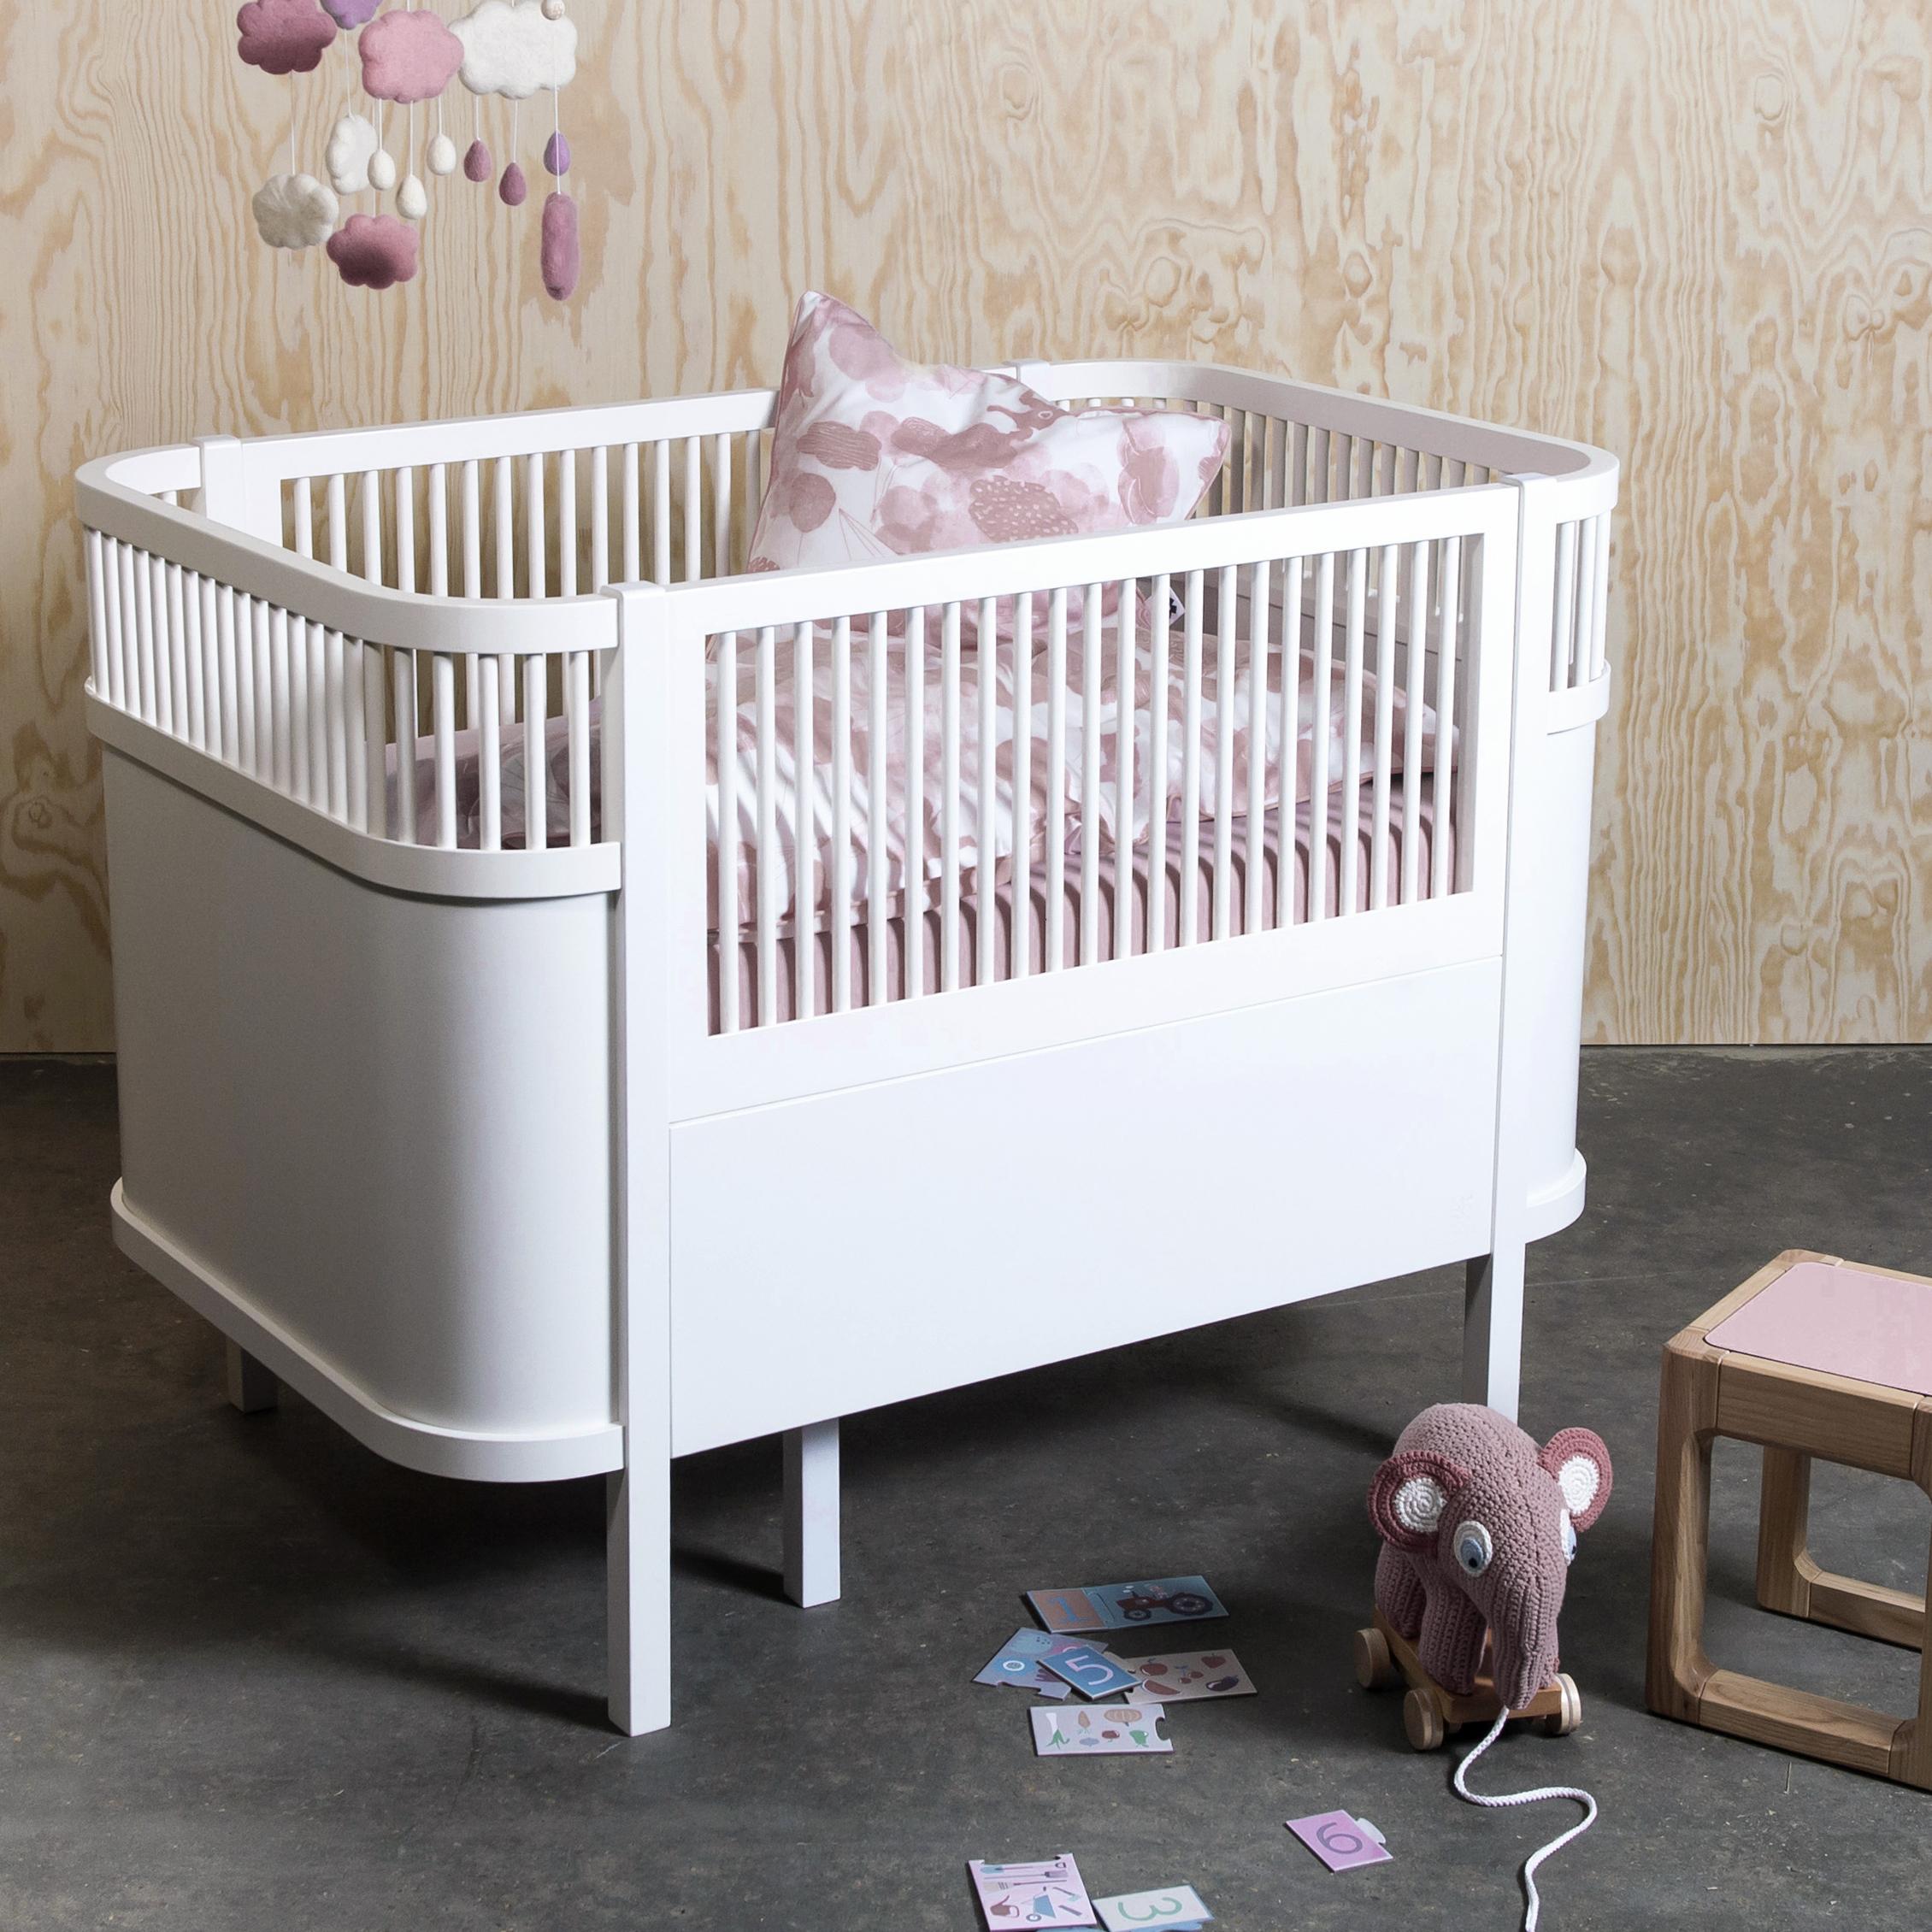 Baby Ledikant Maat.Sebra Kili Hoeslaken 70x120 Cm Wit Lief En Klein